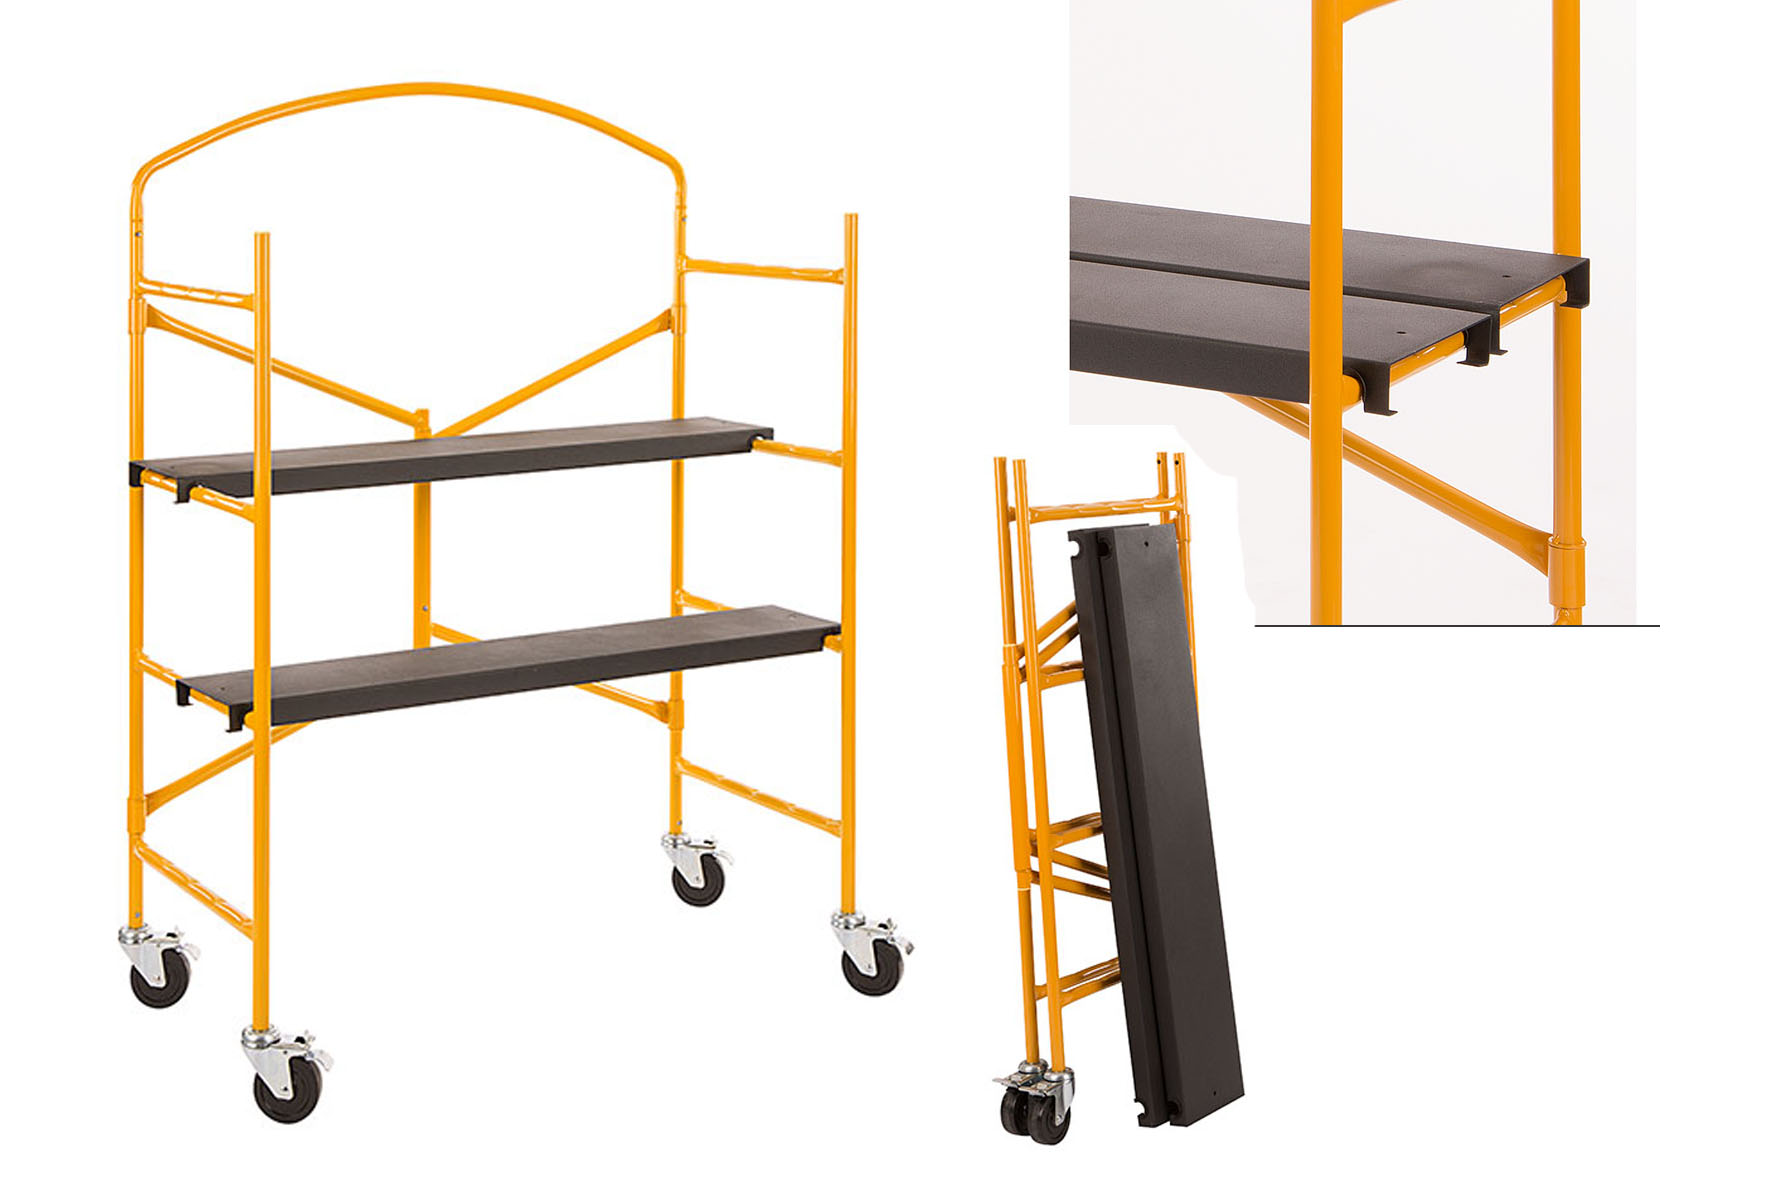 echafaudage pliant yellow tiger achat en ligne ou dans notre magasin. Black Bedroom Furniture Sets. Home Design Ideas